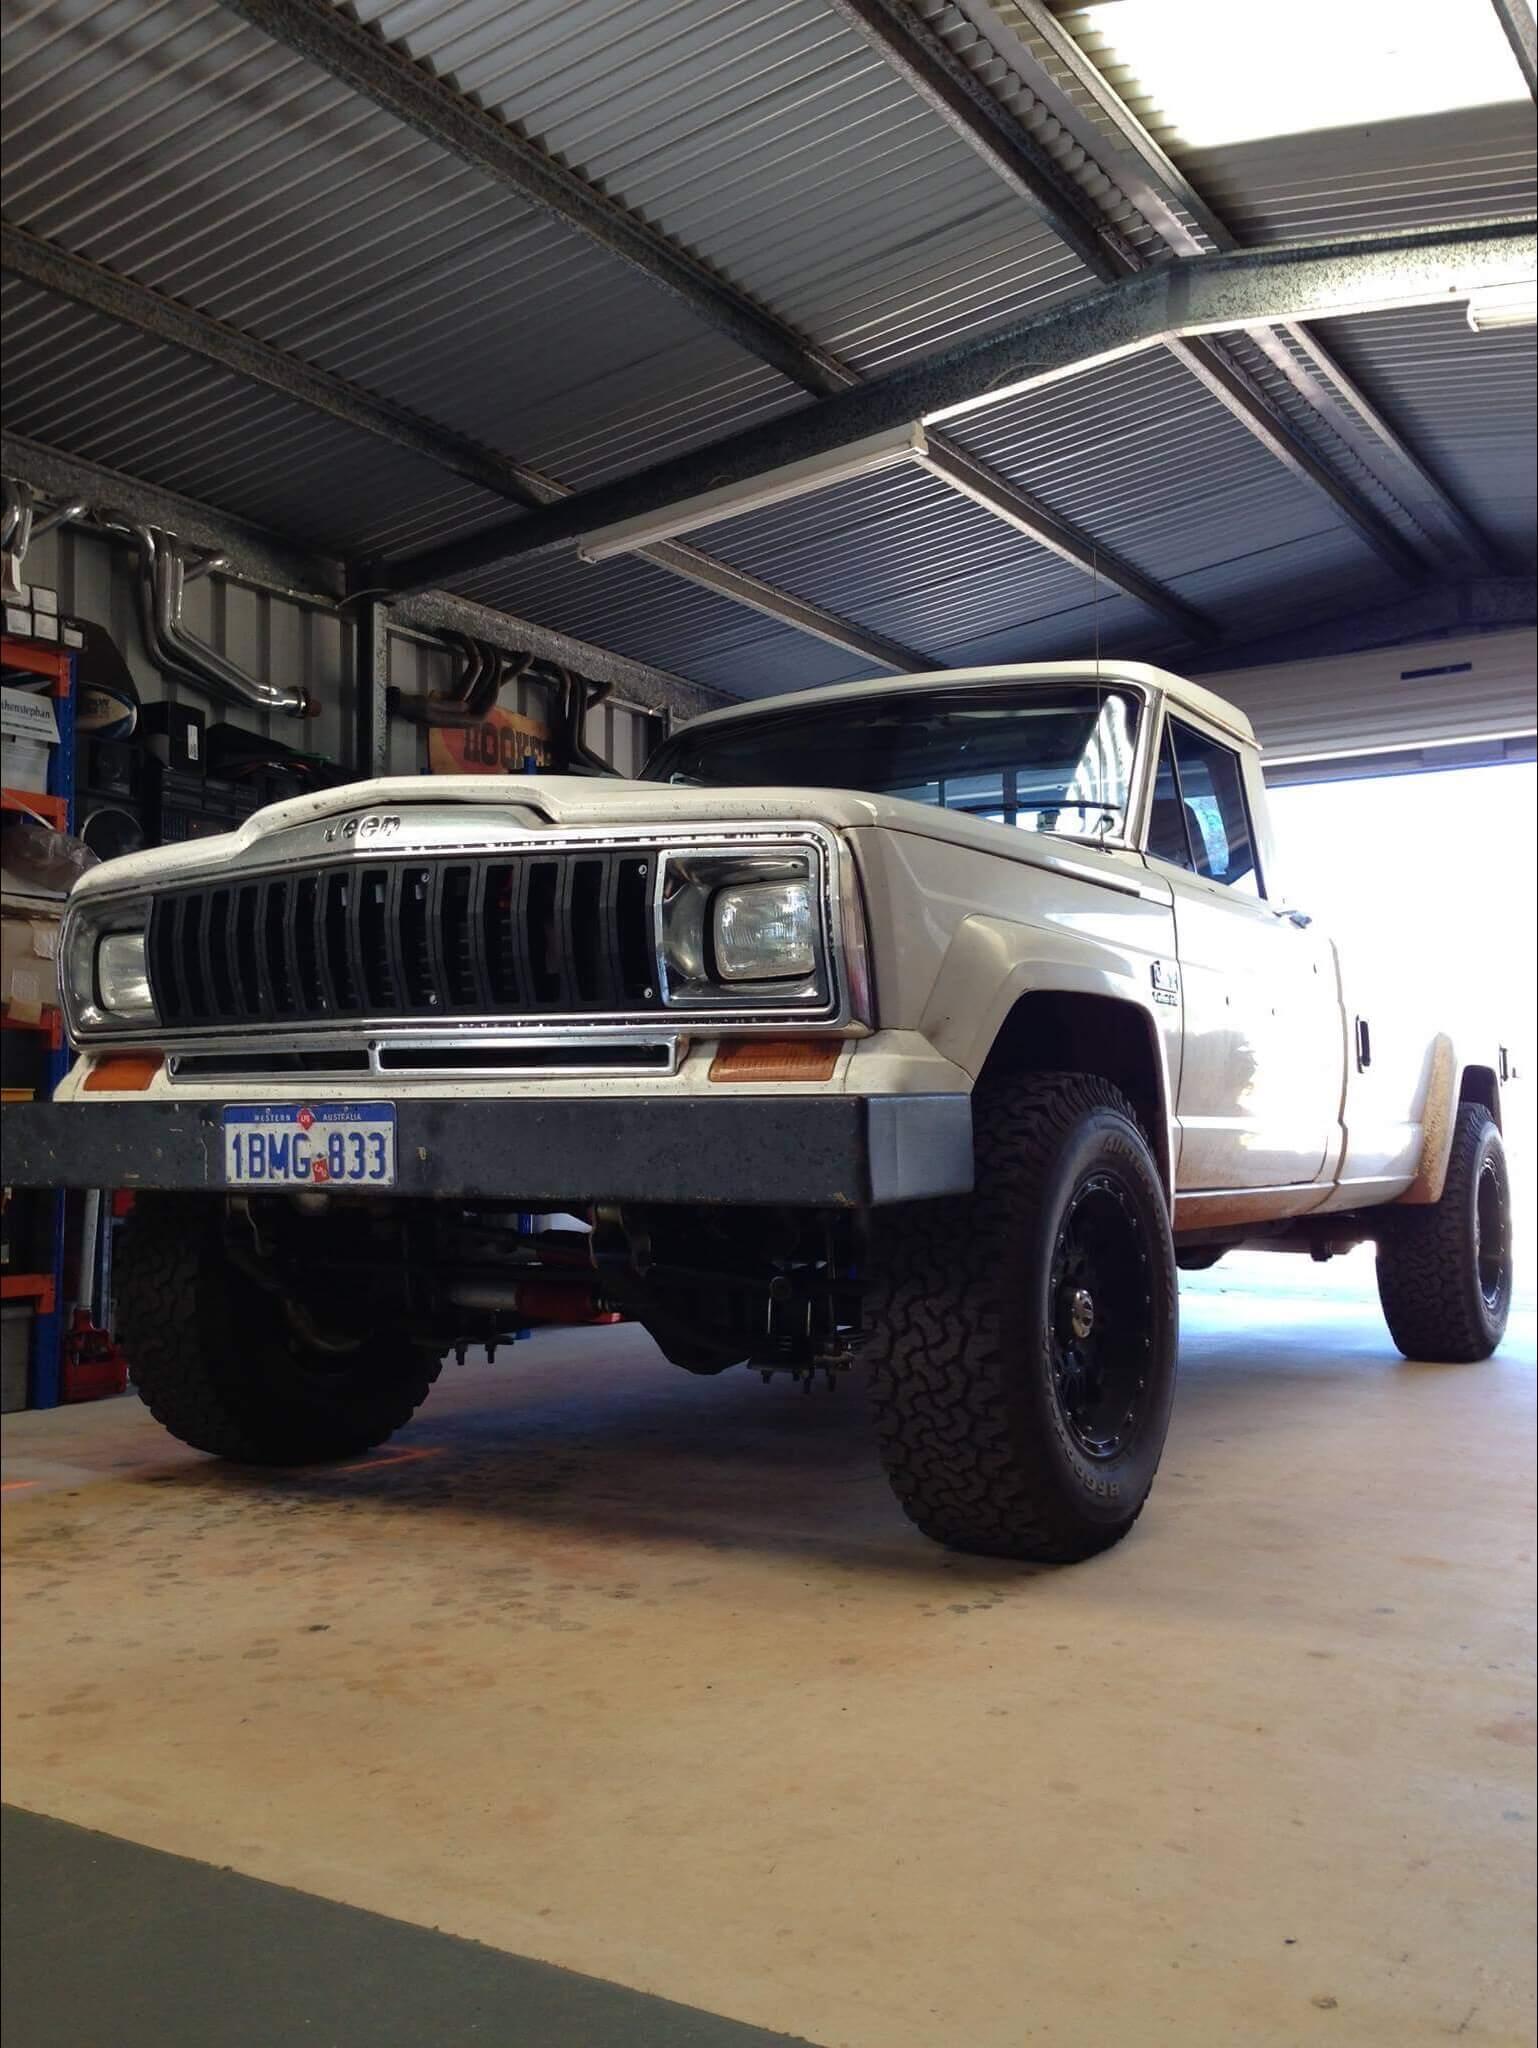 MAJOR's 1984 Jeep J20 - Holley My Garage